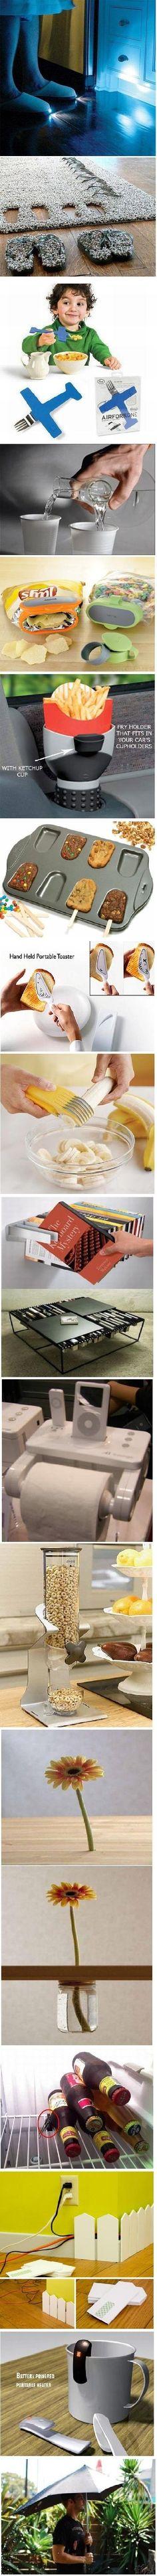 Simple but brilliant ideas